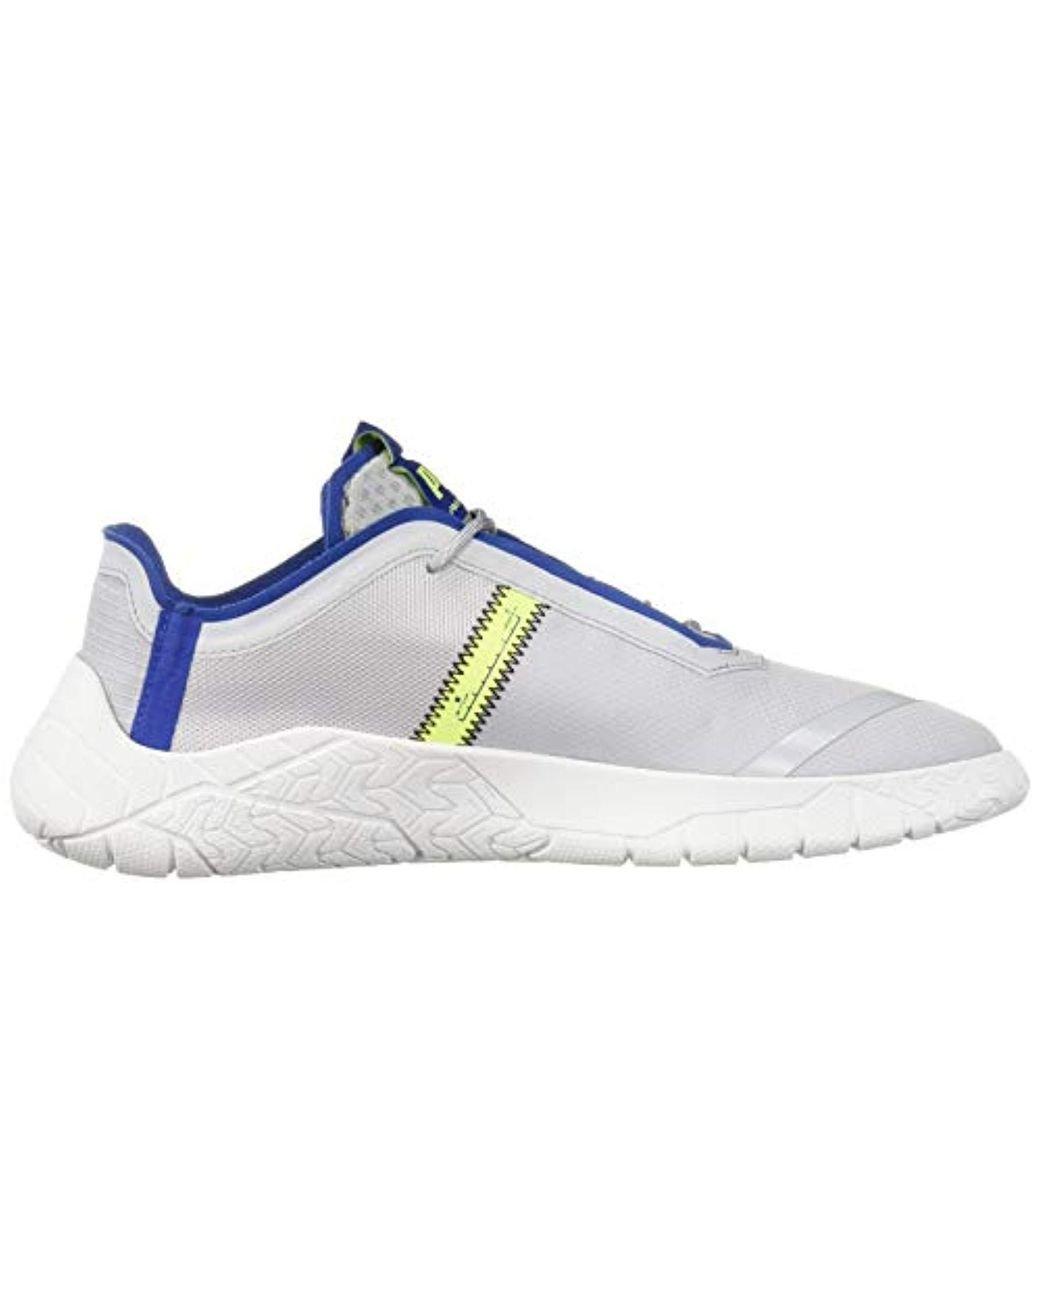 PUMA Replicat X Circuit Sneaker in Blue for Men Save 14